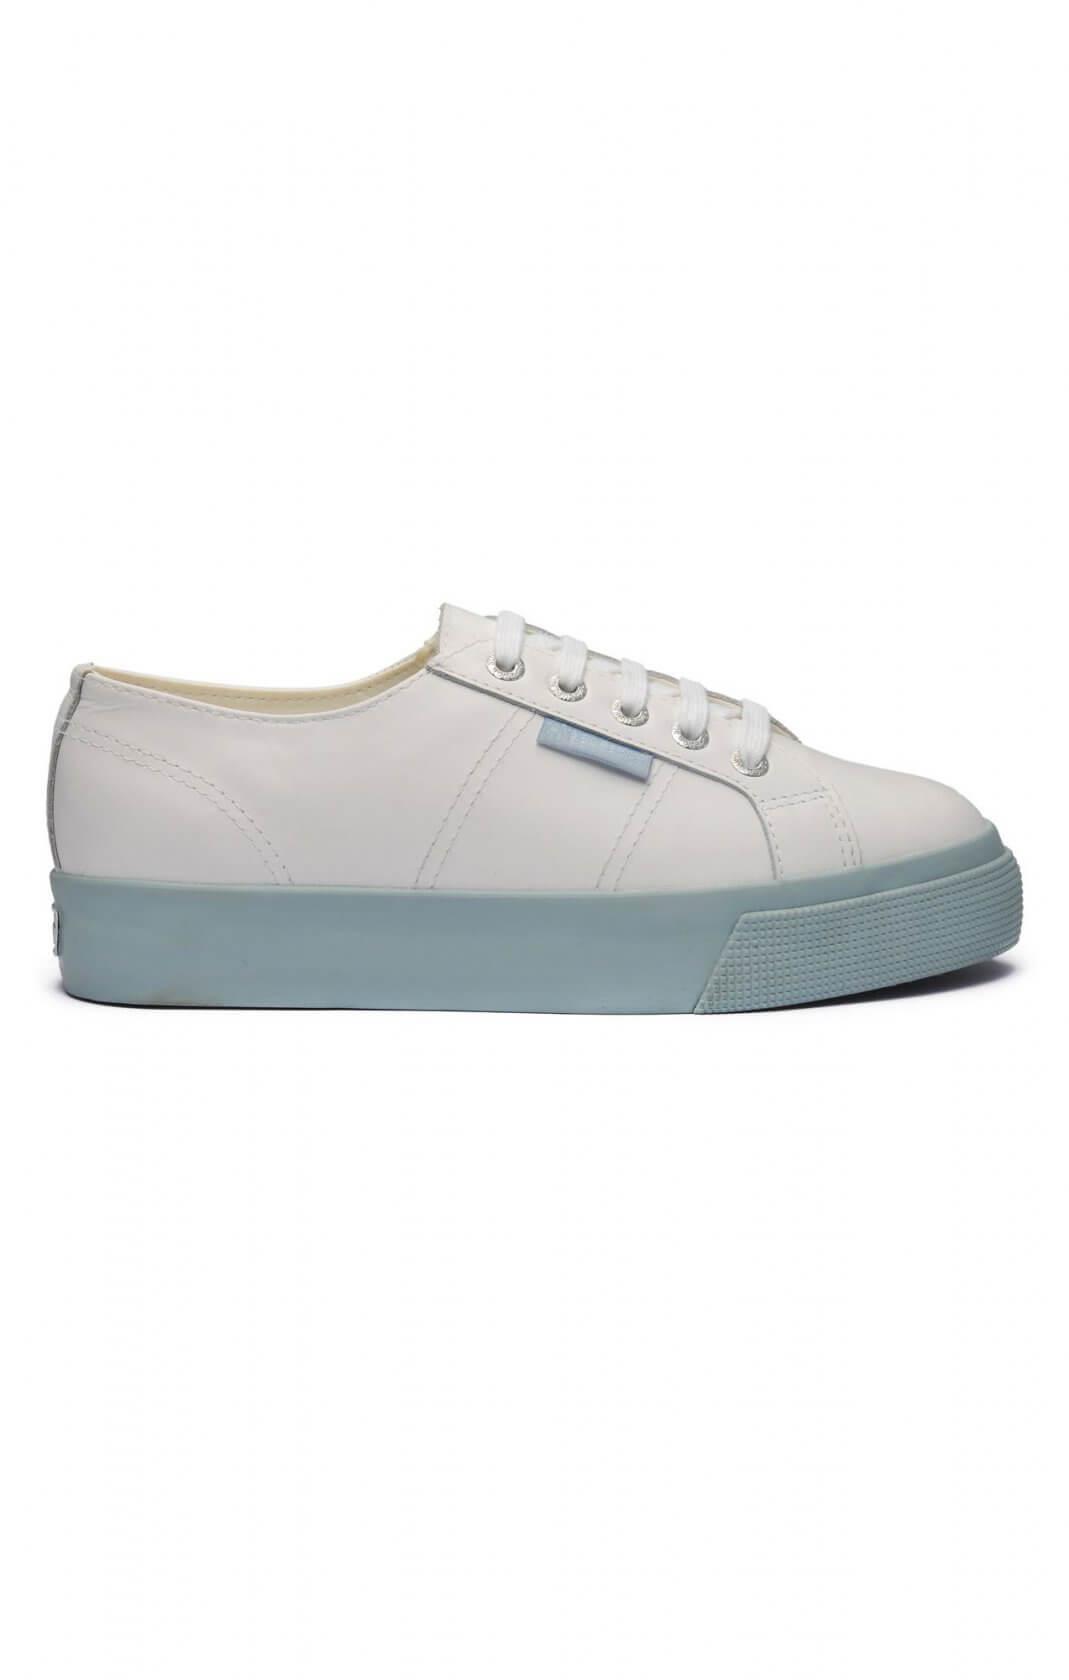 SUPERGA 2730 NAPPA LEATHER WHITE BLUE